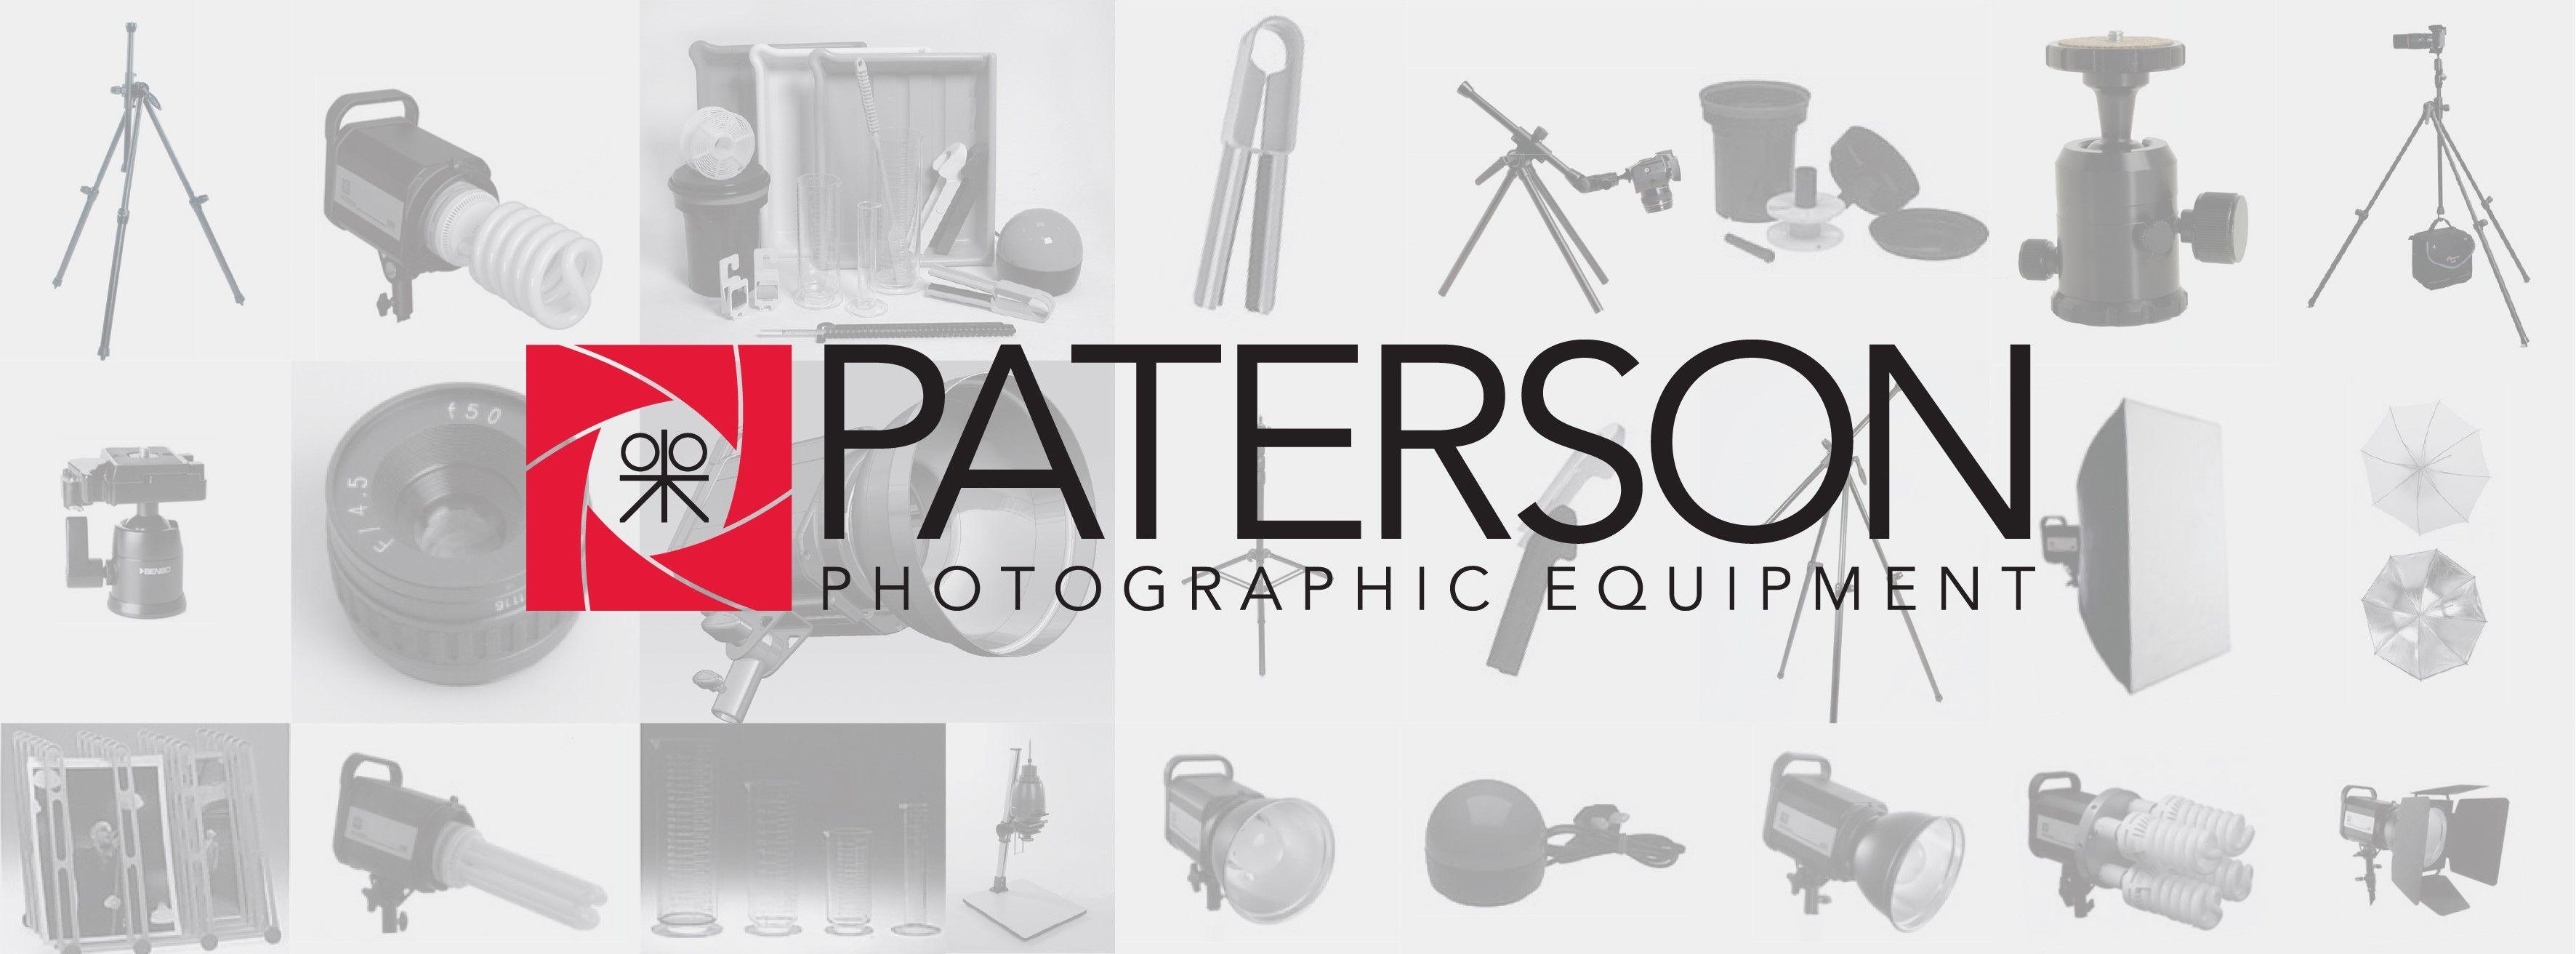 Paterson Photographic